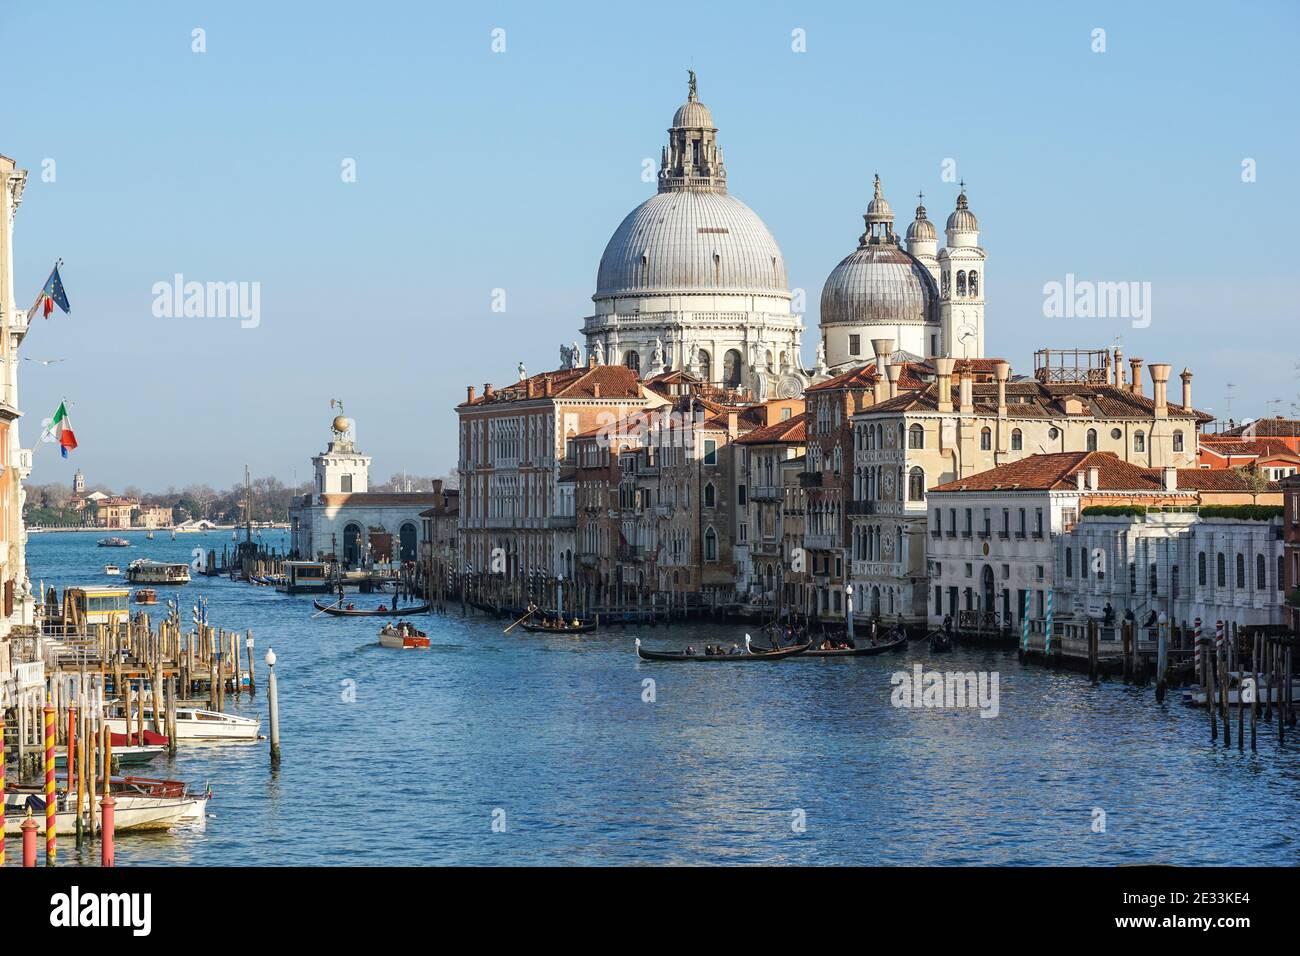 Der Canal Grande und die Basilika Santa Maria della Salute in Venedig, Italien Stockfoto